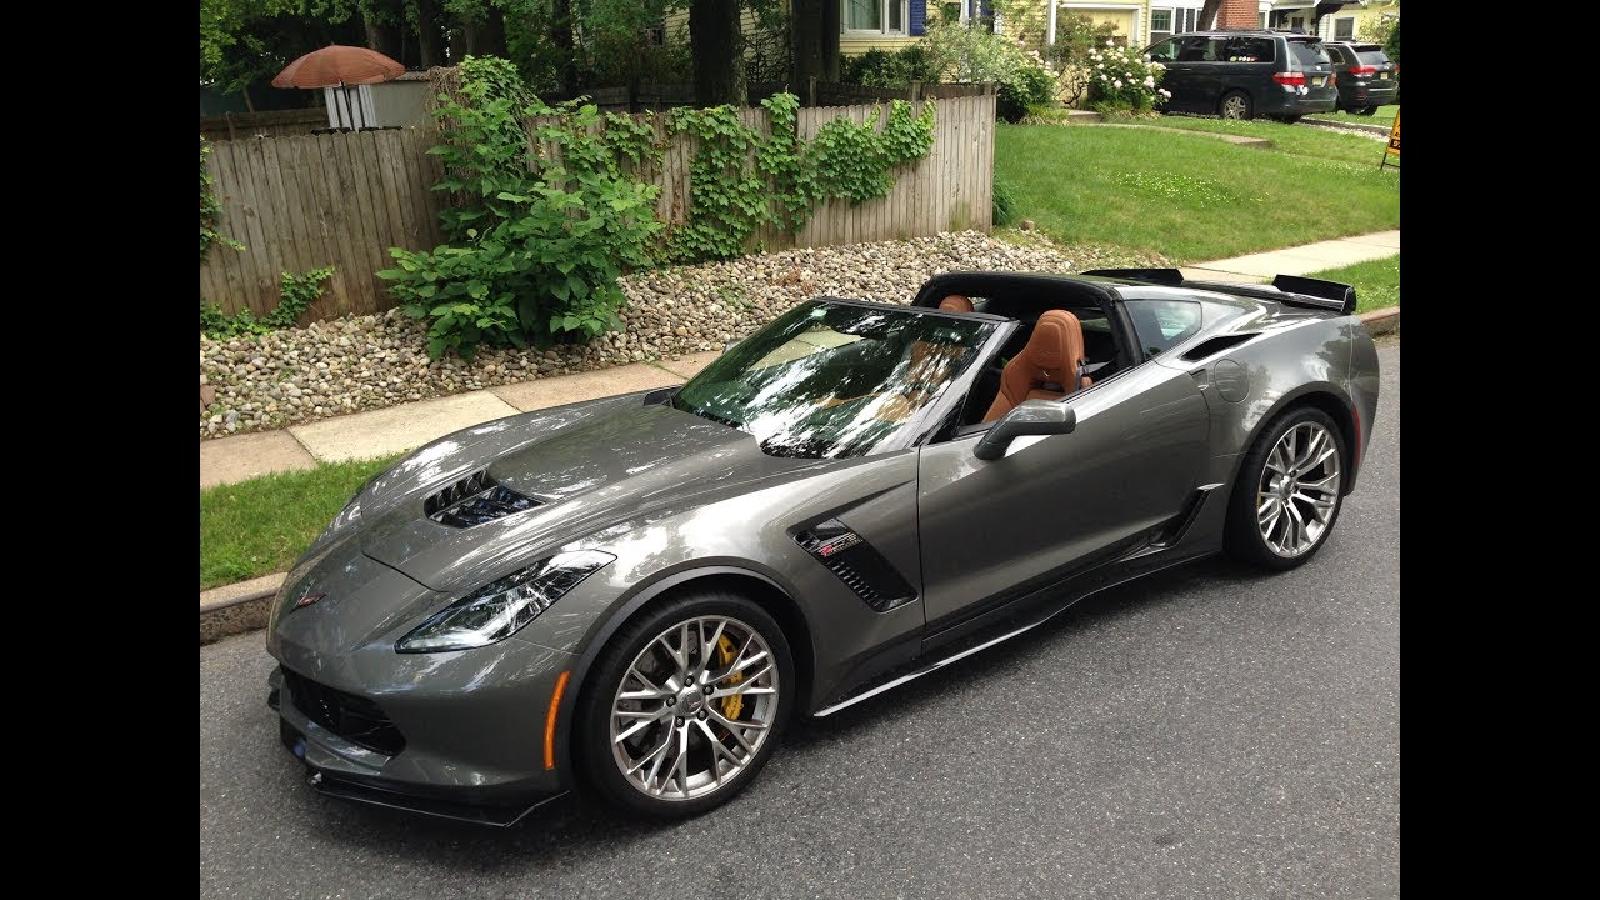 Romancing the Corvette: Stories of Love